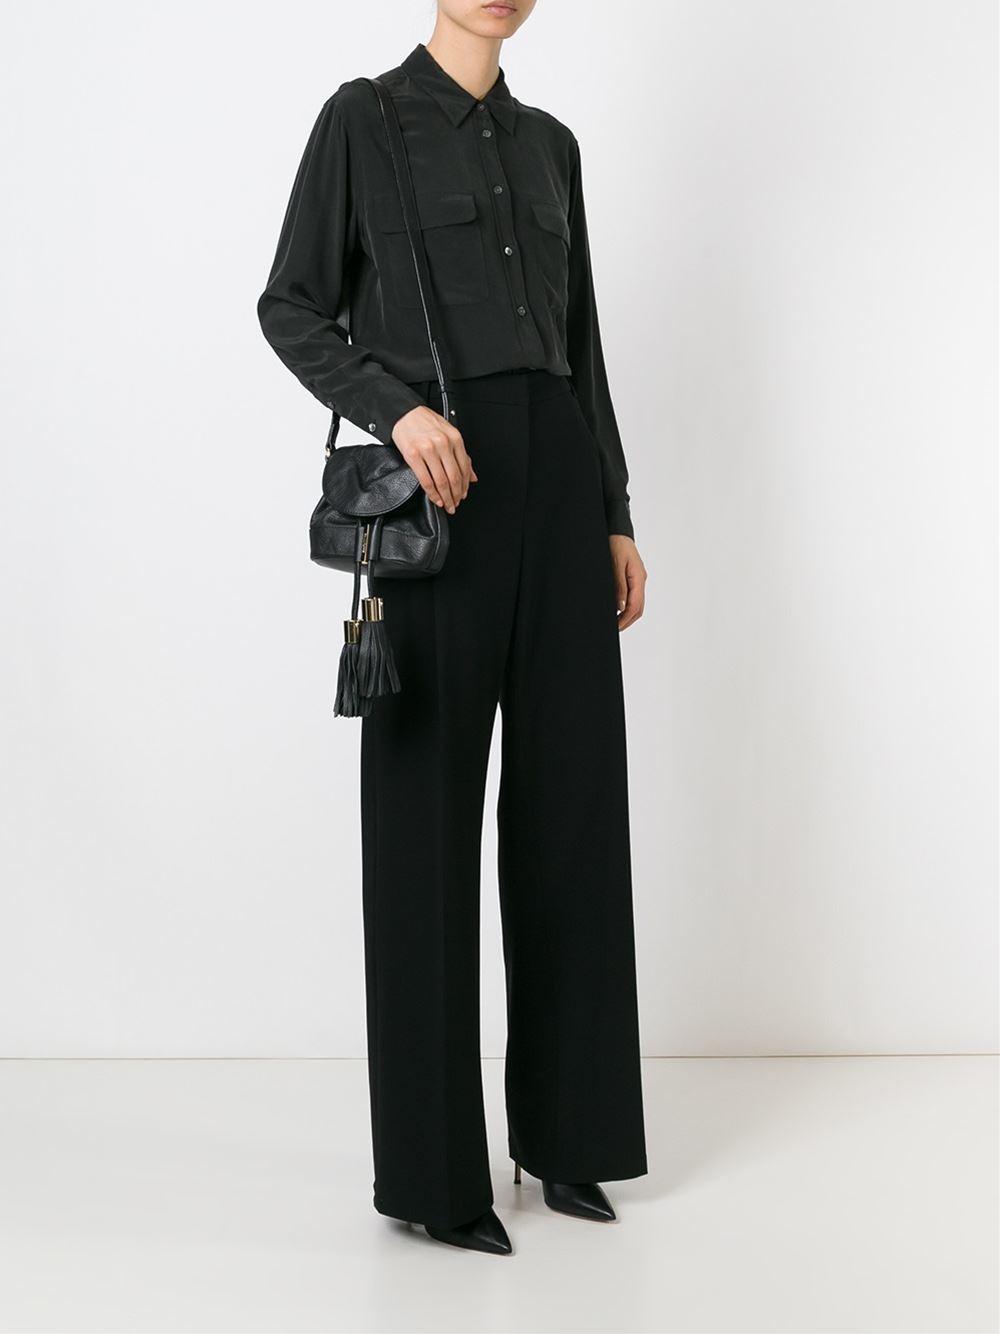 See by chlo�� Mini Vicki Bag in Black | Lyst